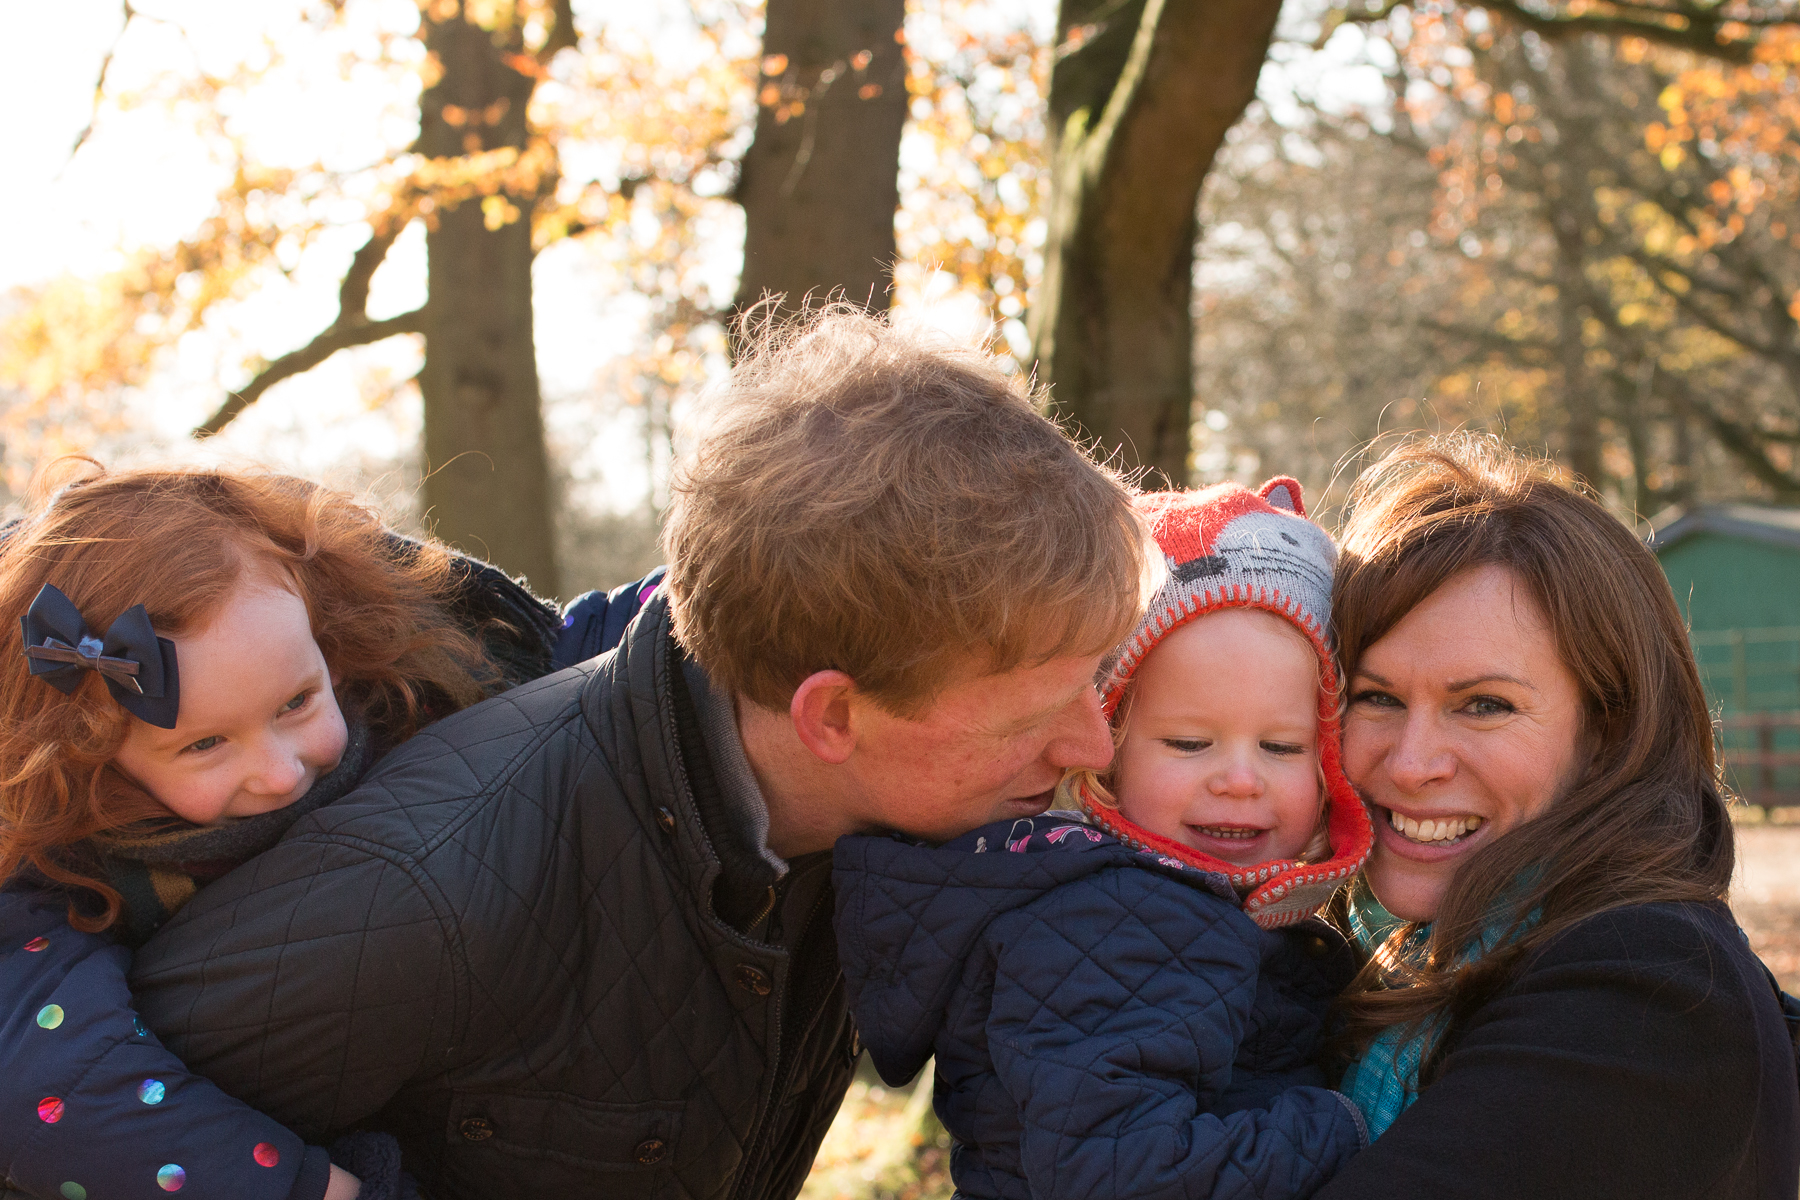 family_photography_miltonkeynes-7.jpg